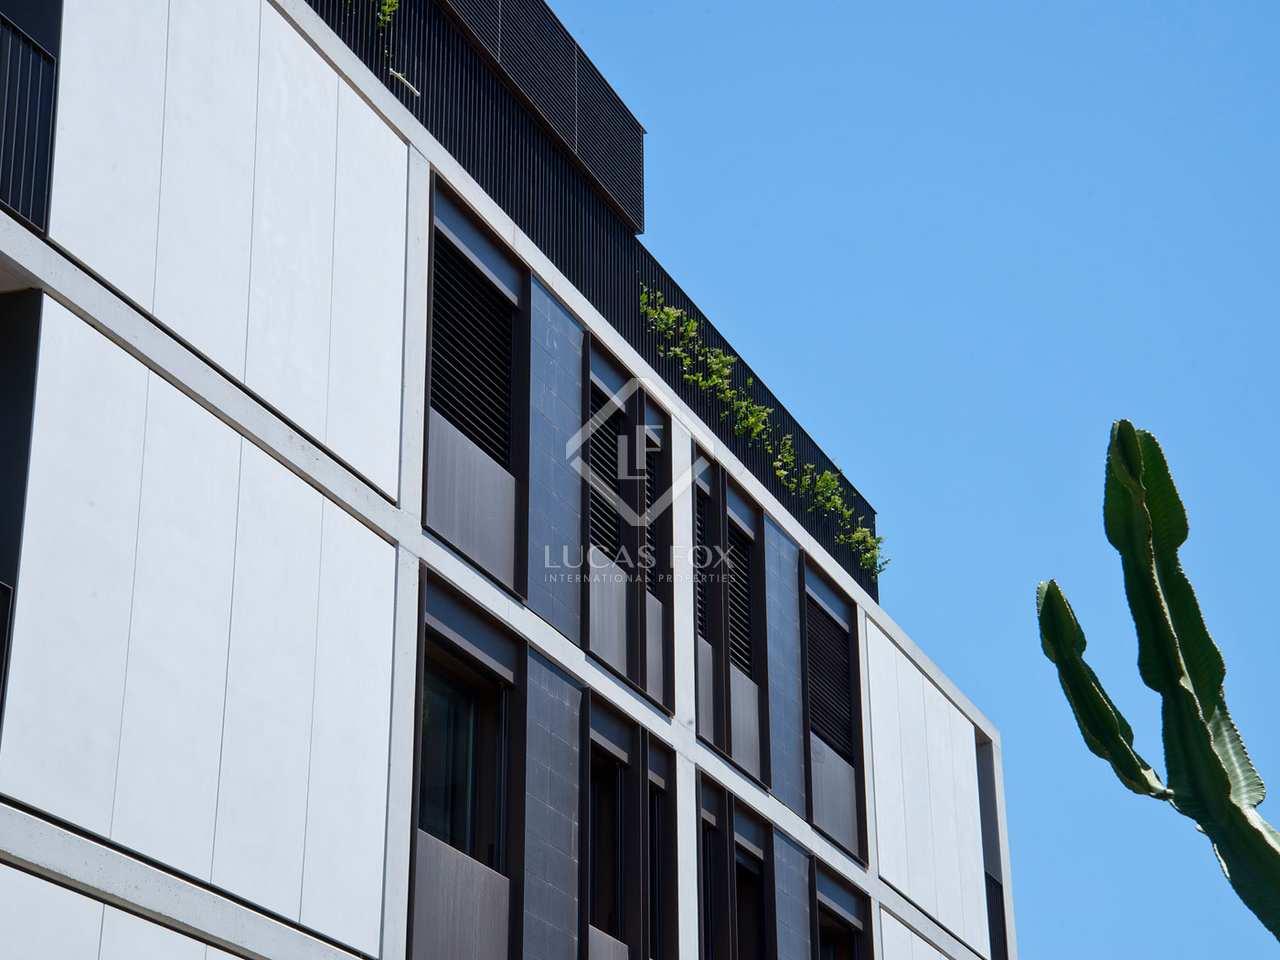 Luxury apartments to buy in pedralbes barcelona - Zona alta barcelona ...